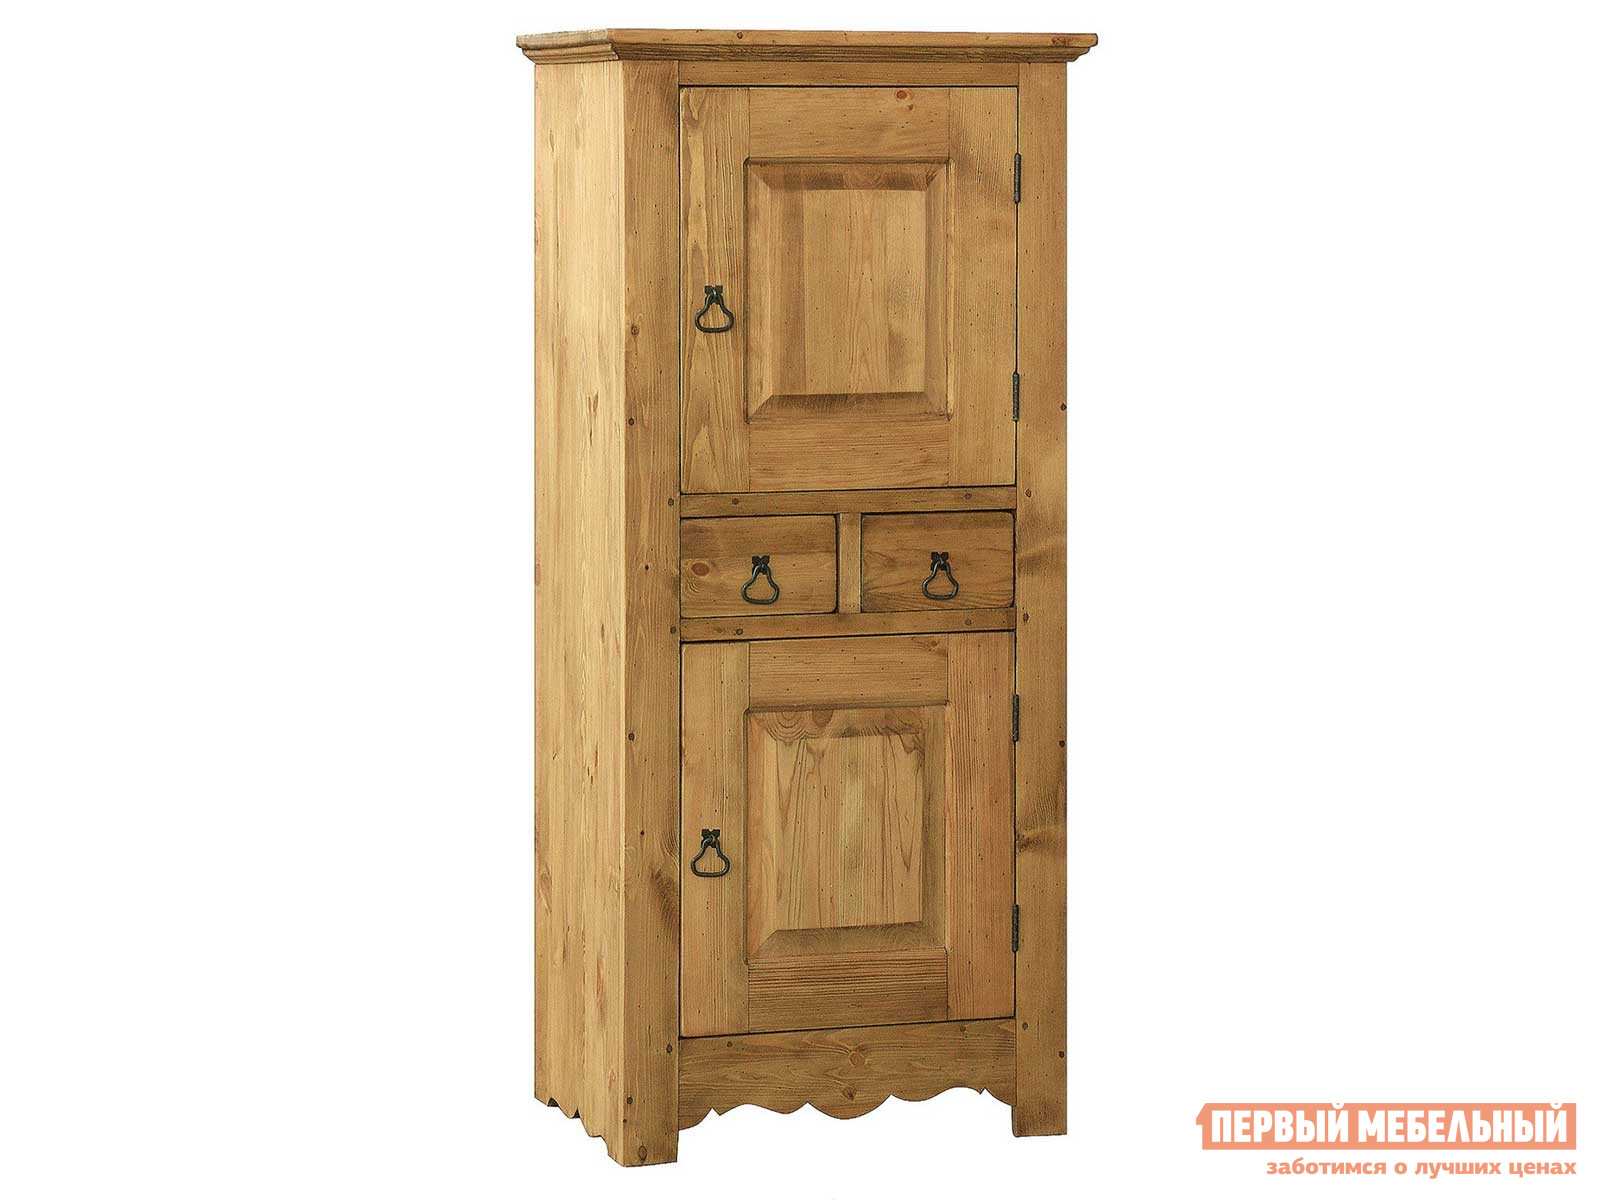 Шкаф распашной Волшебная сосна HOMME DEBOUT portes pleines (HOM.DEB.PP) барный шкаф волшебная сосна bar ouvrant barouv